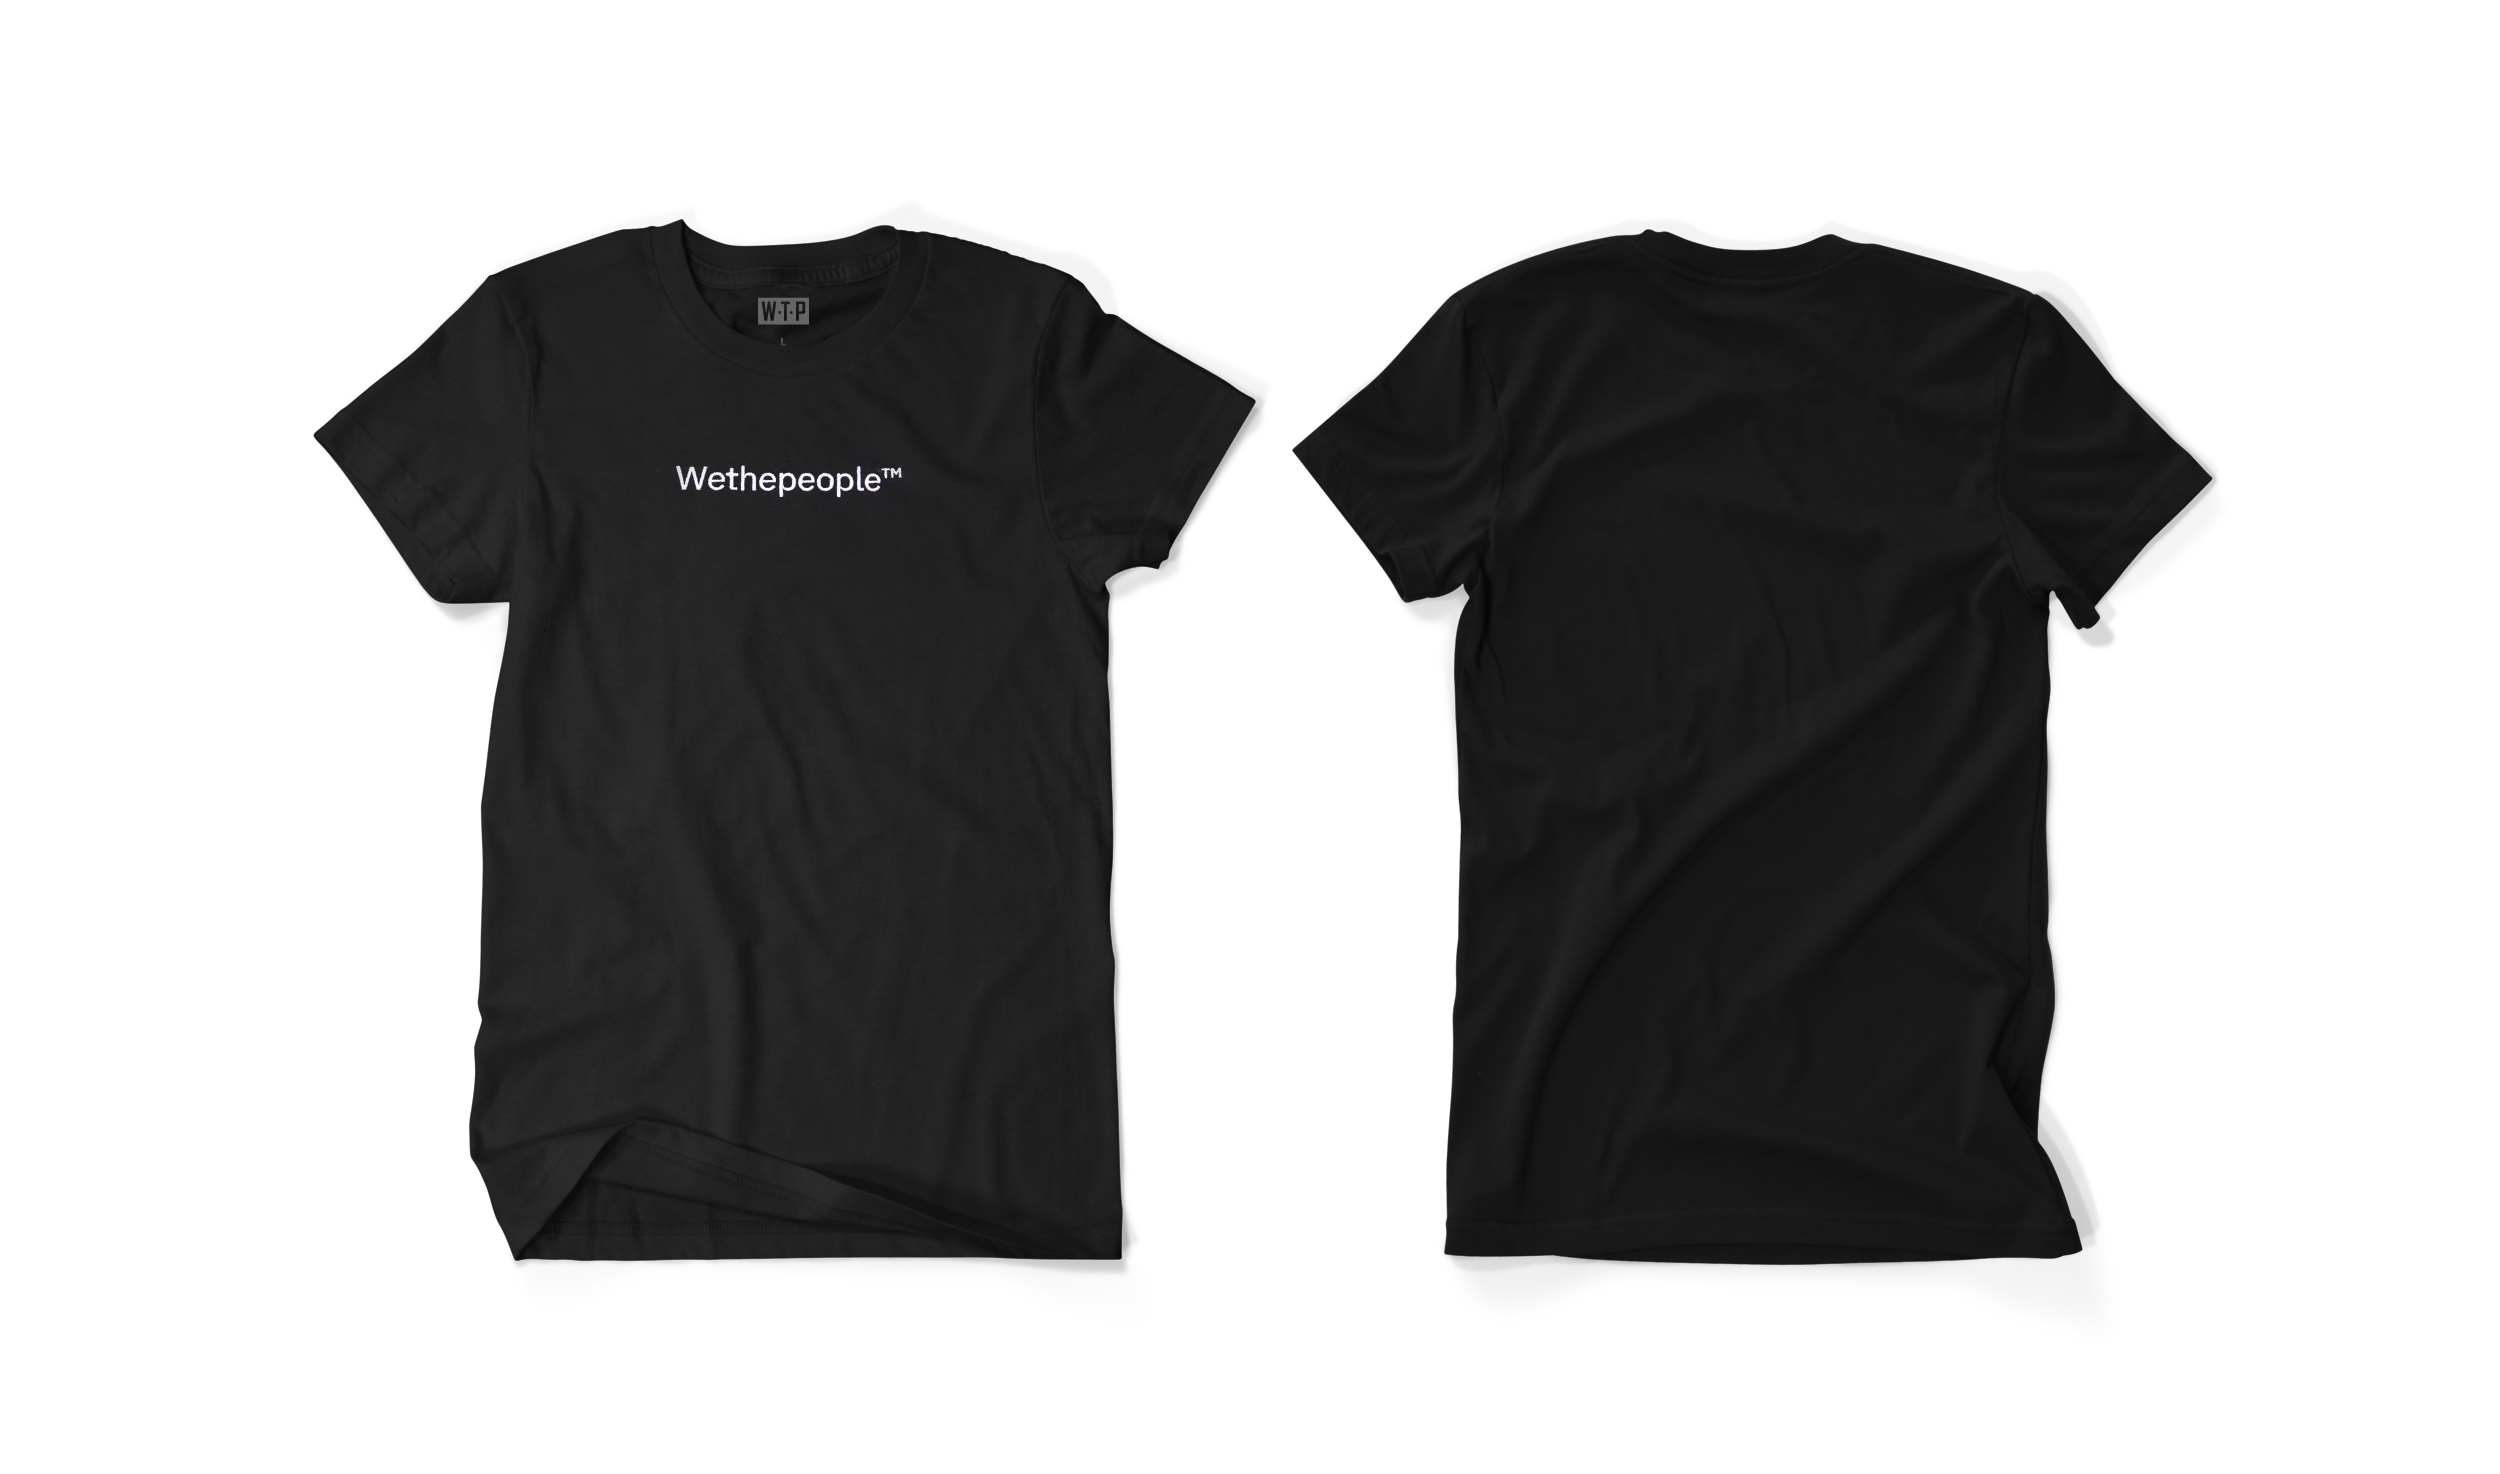 Wethepeople BMX Embroidery T-Shirt in schwarz